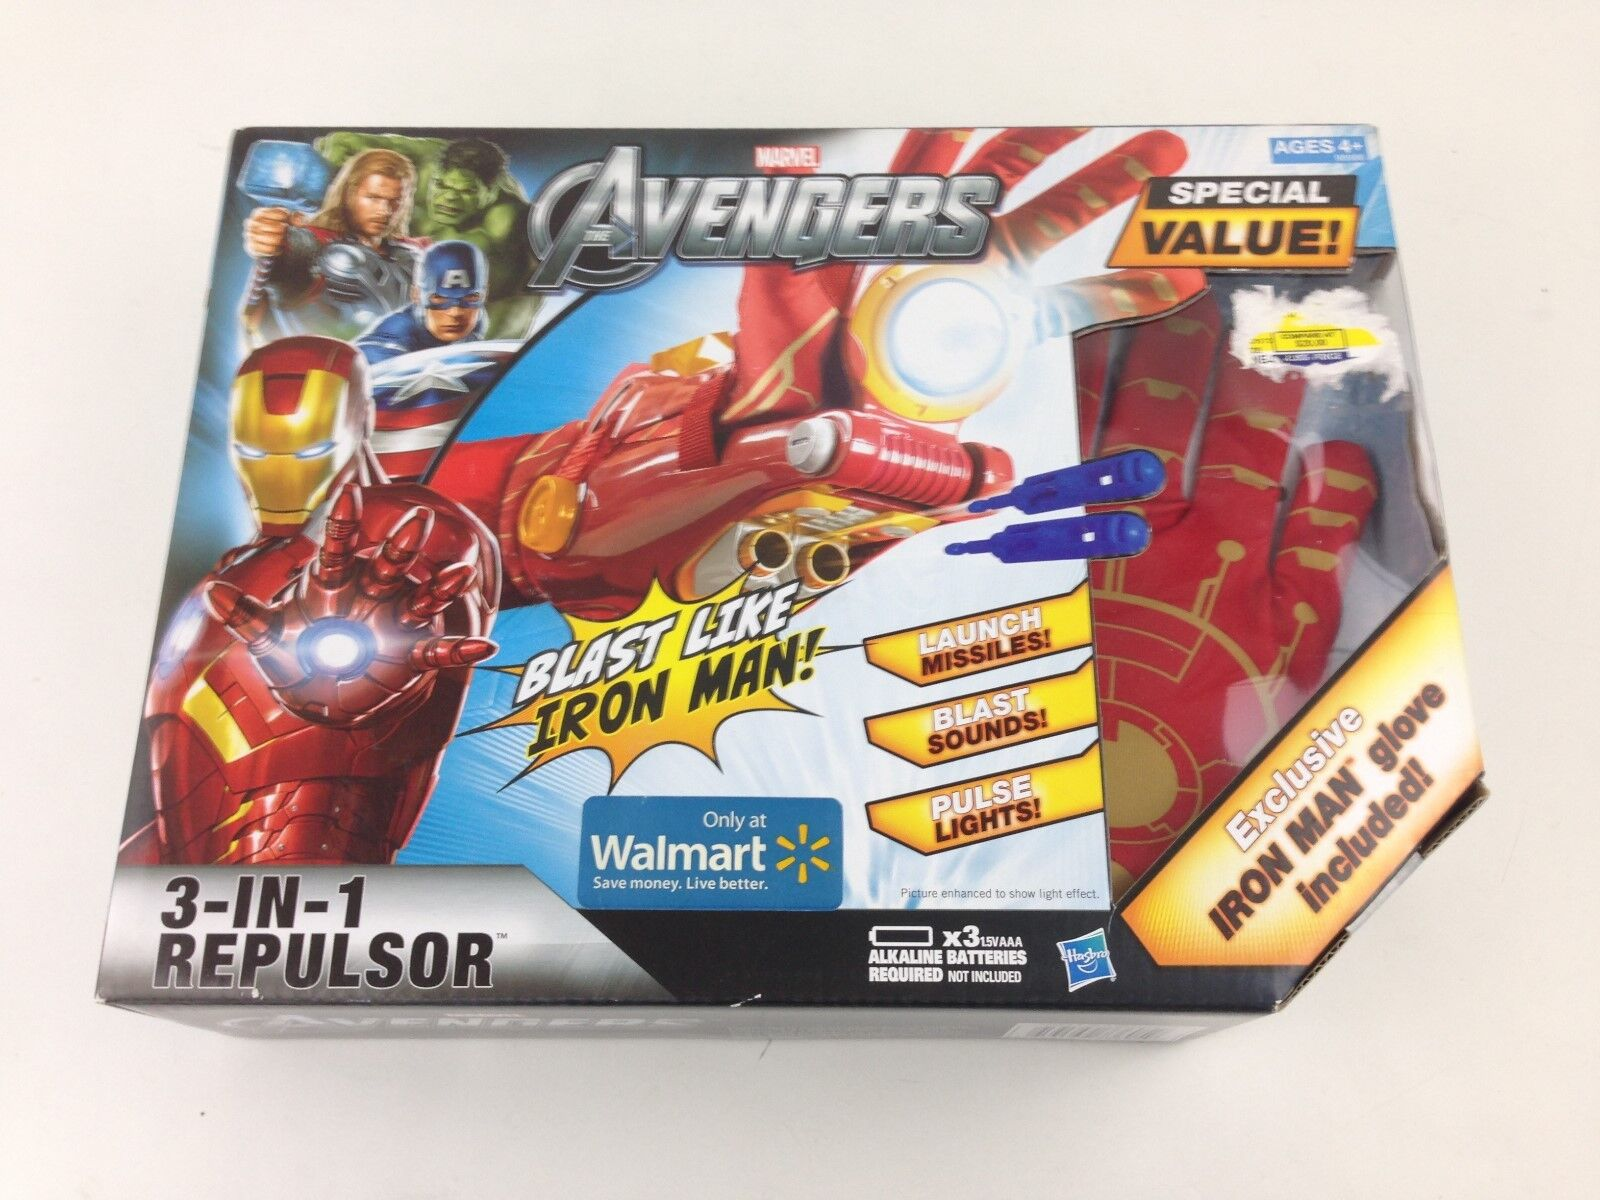 iron man 3 in 1 repulsor marvel avengers walmart exklusive handschuh hasbro 2012 nib